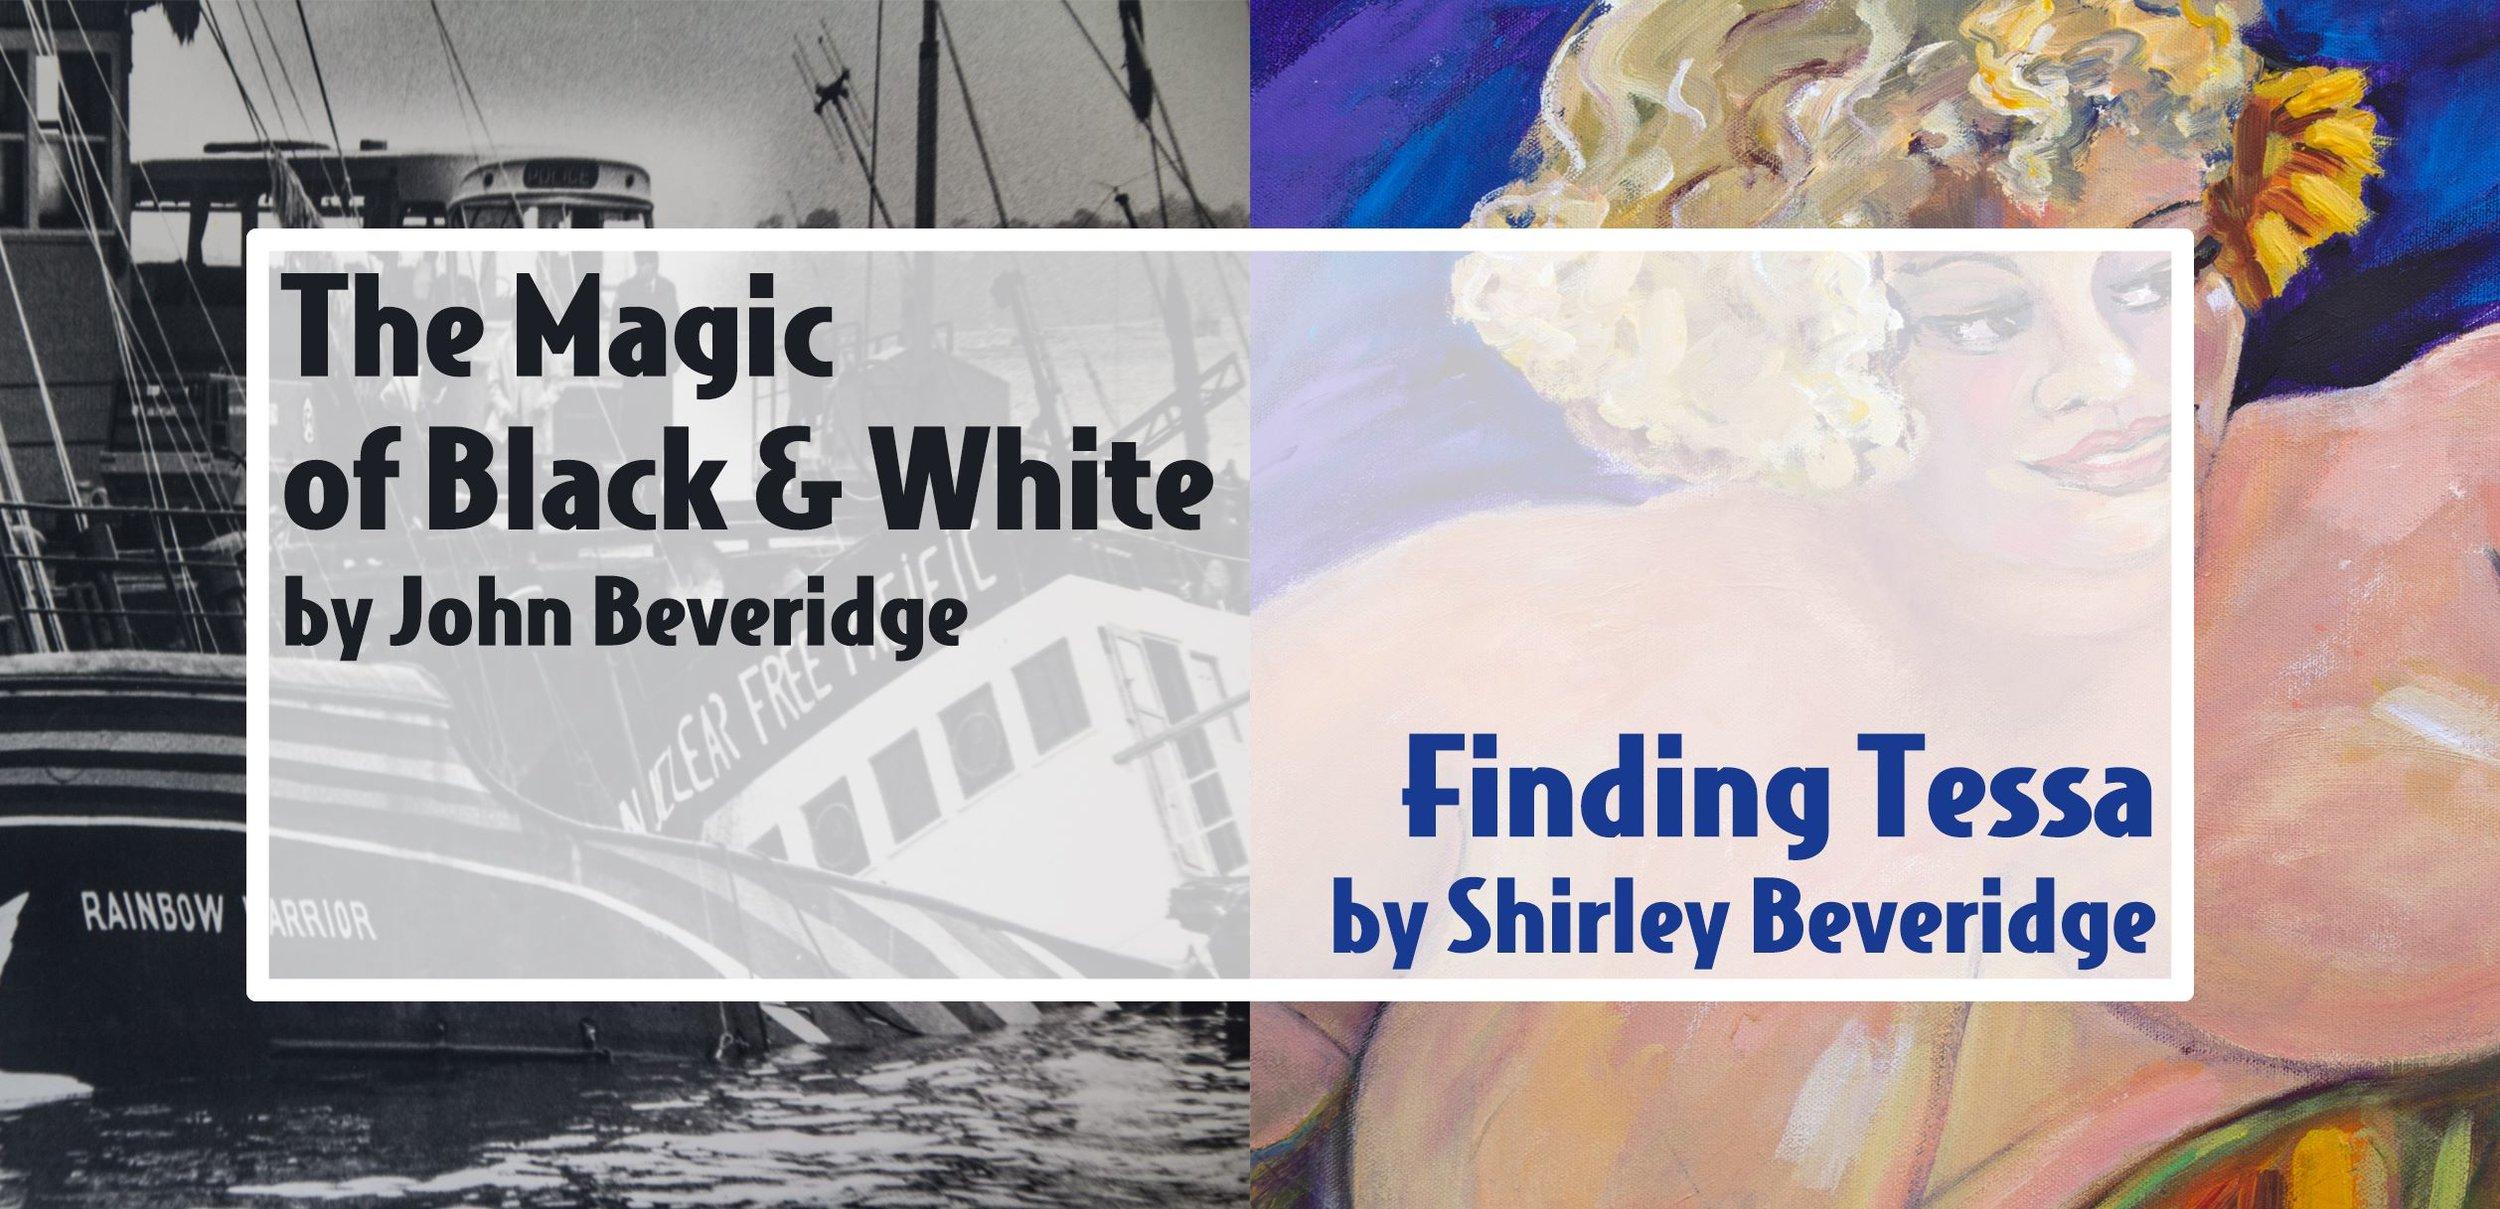 Beveridge Exhibition.jpg